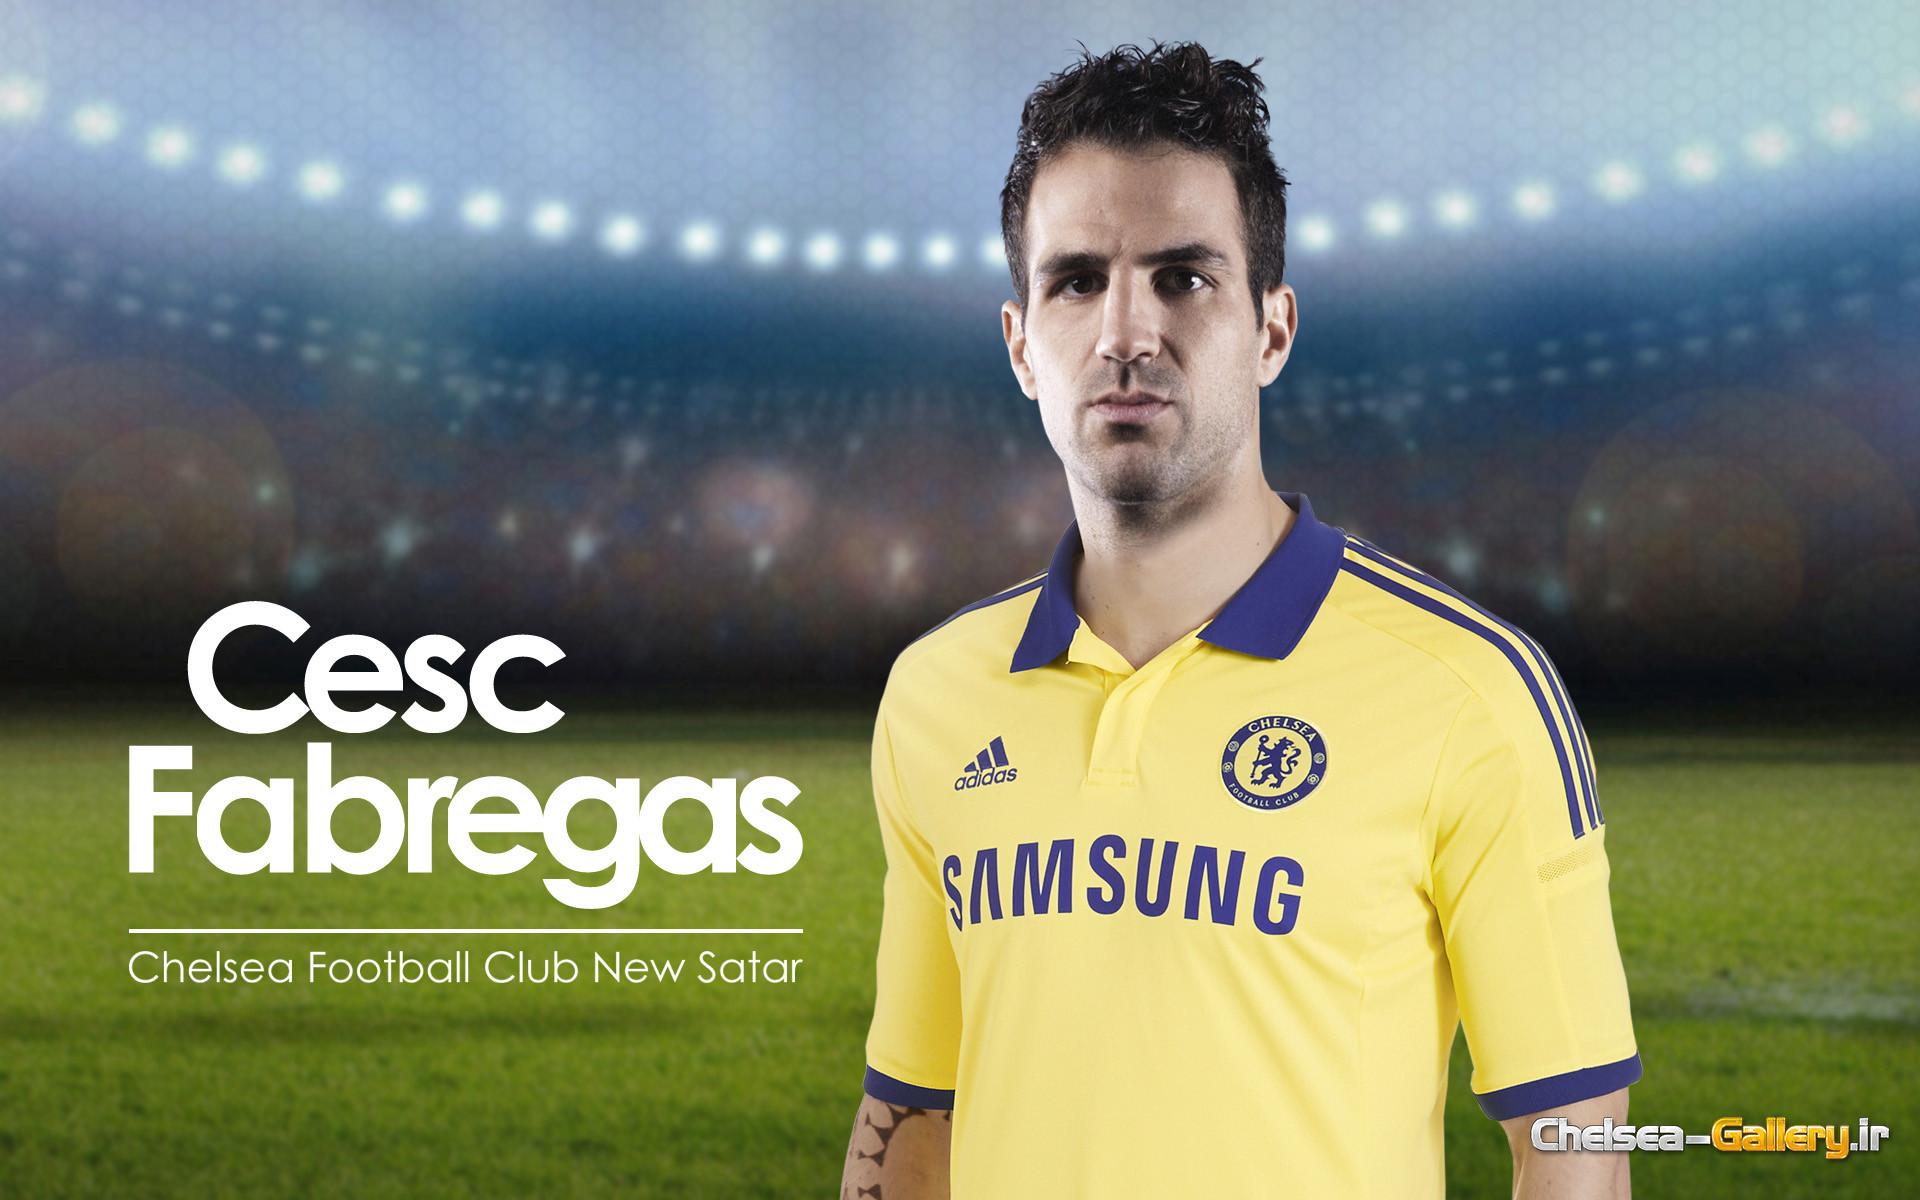 HD Chelsea FC Wallpaper Cesc Fabregas Wallpapers Arsenal 1920x1200